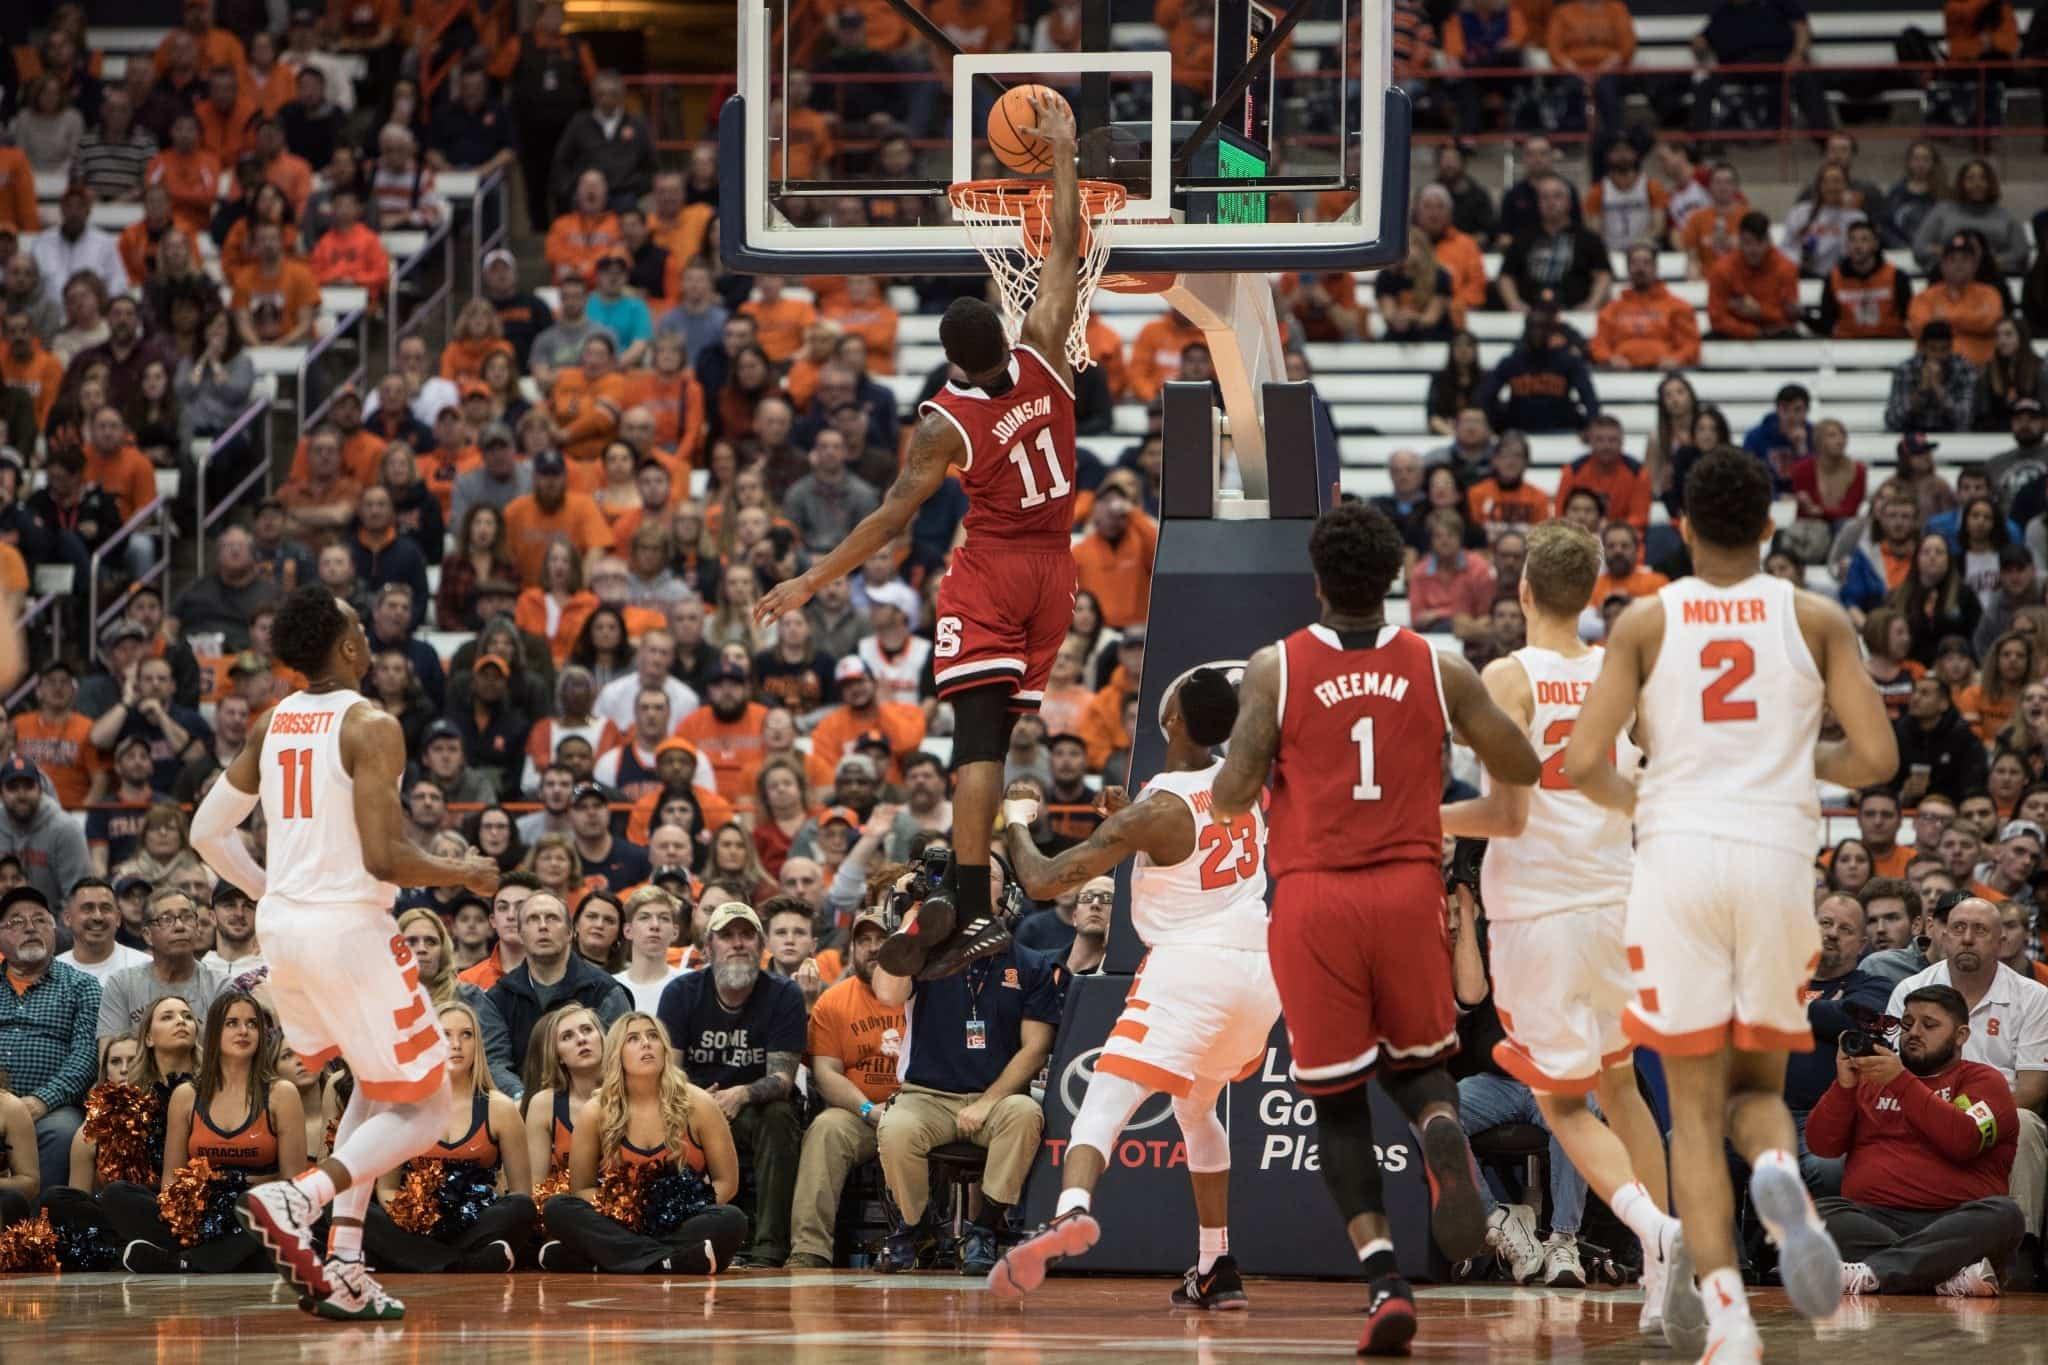 Men's basketball versus NC State